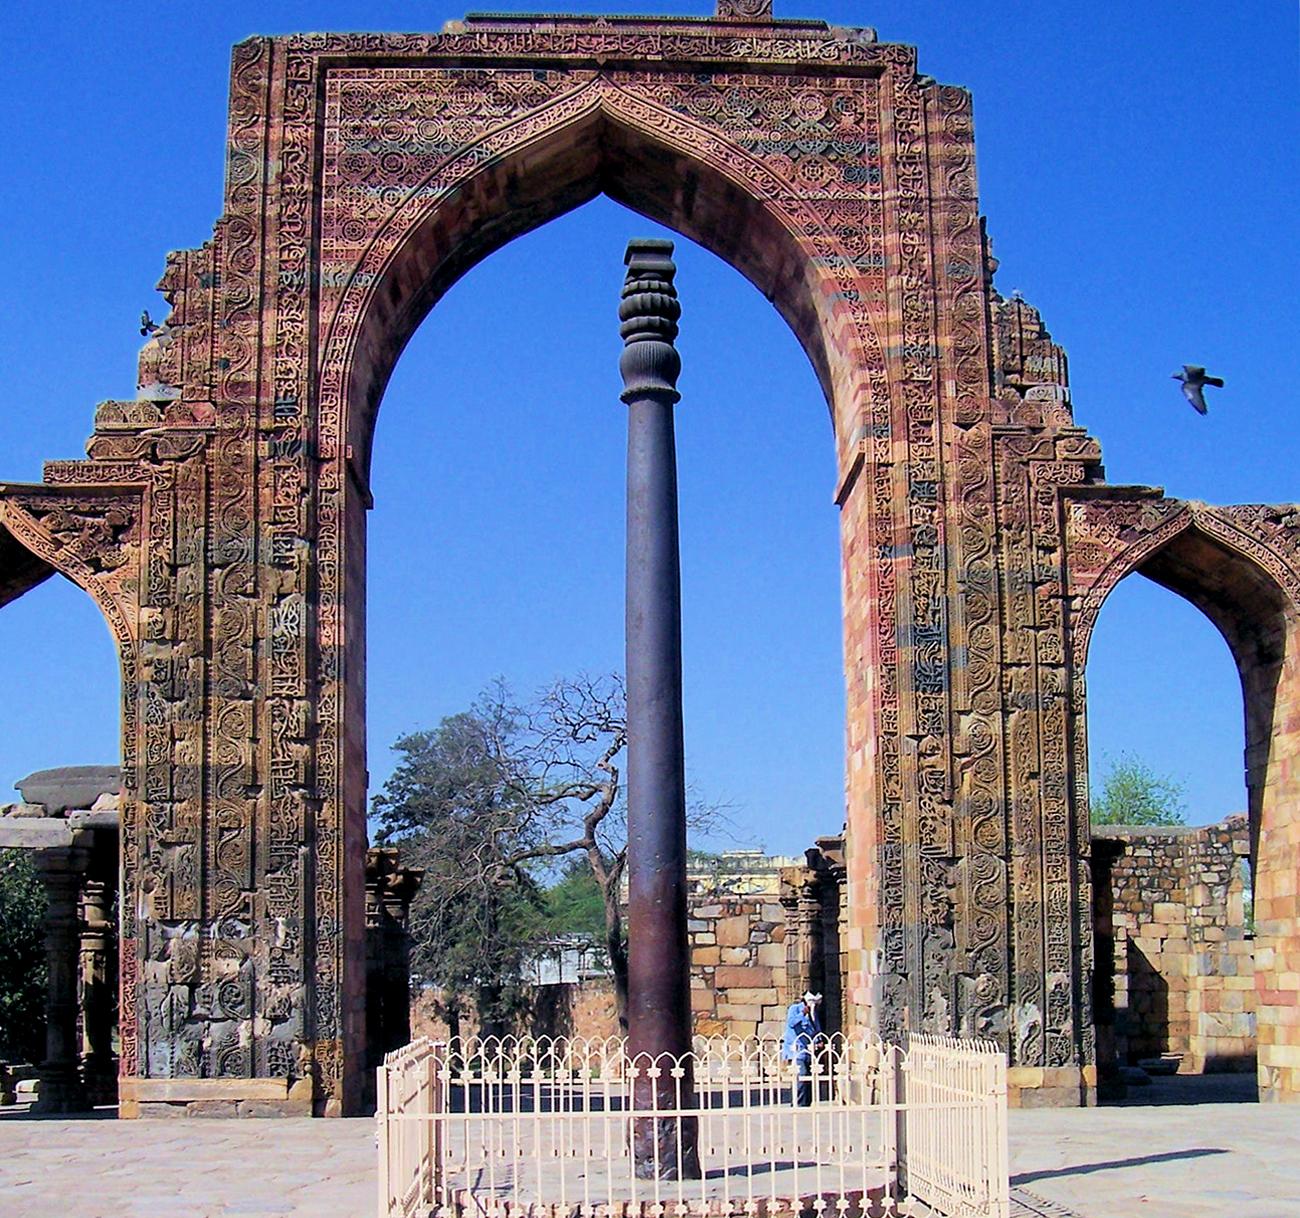 The Hero of Islam, Saladin's Damascus Blade